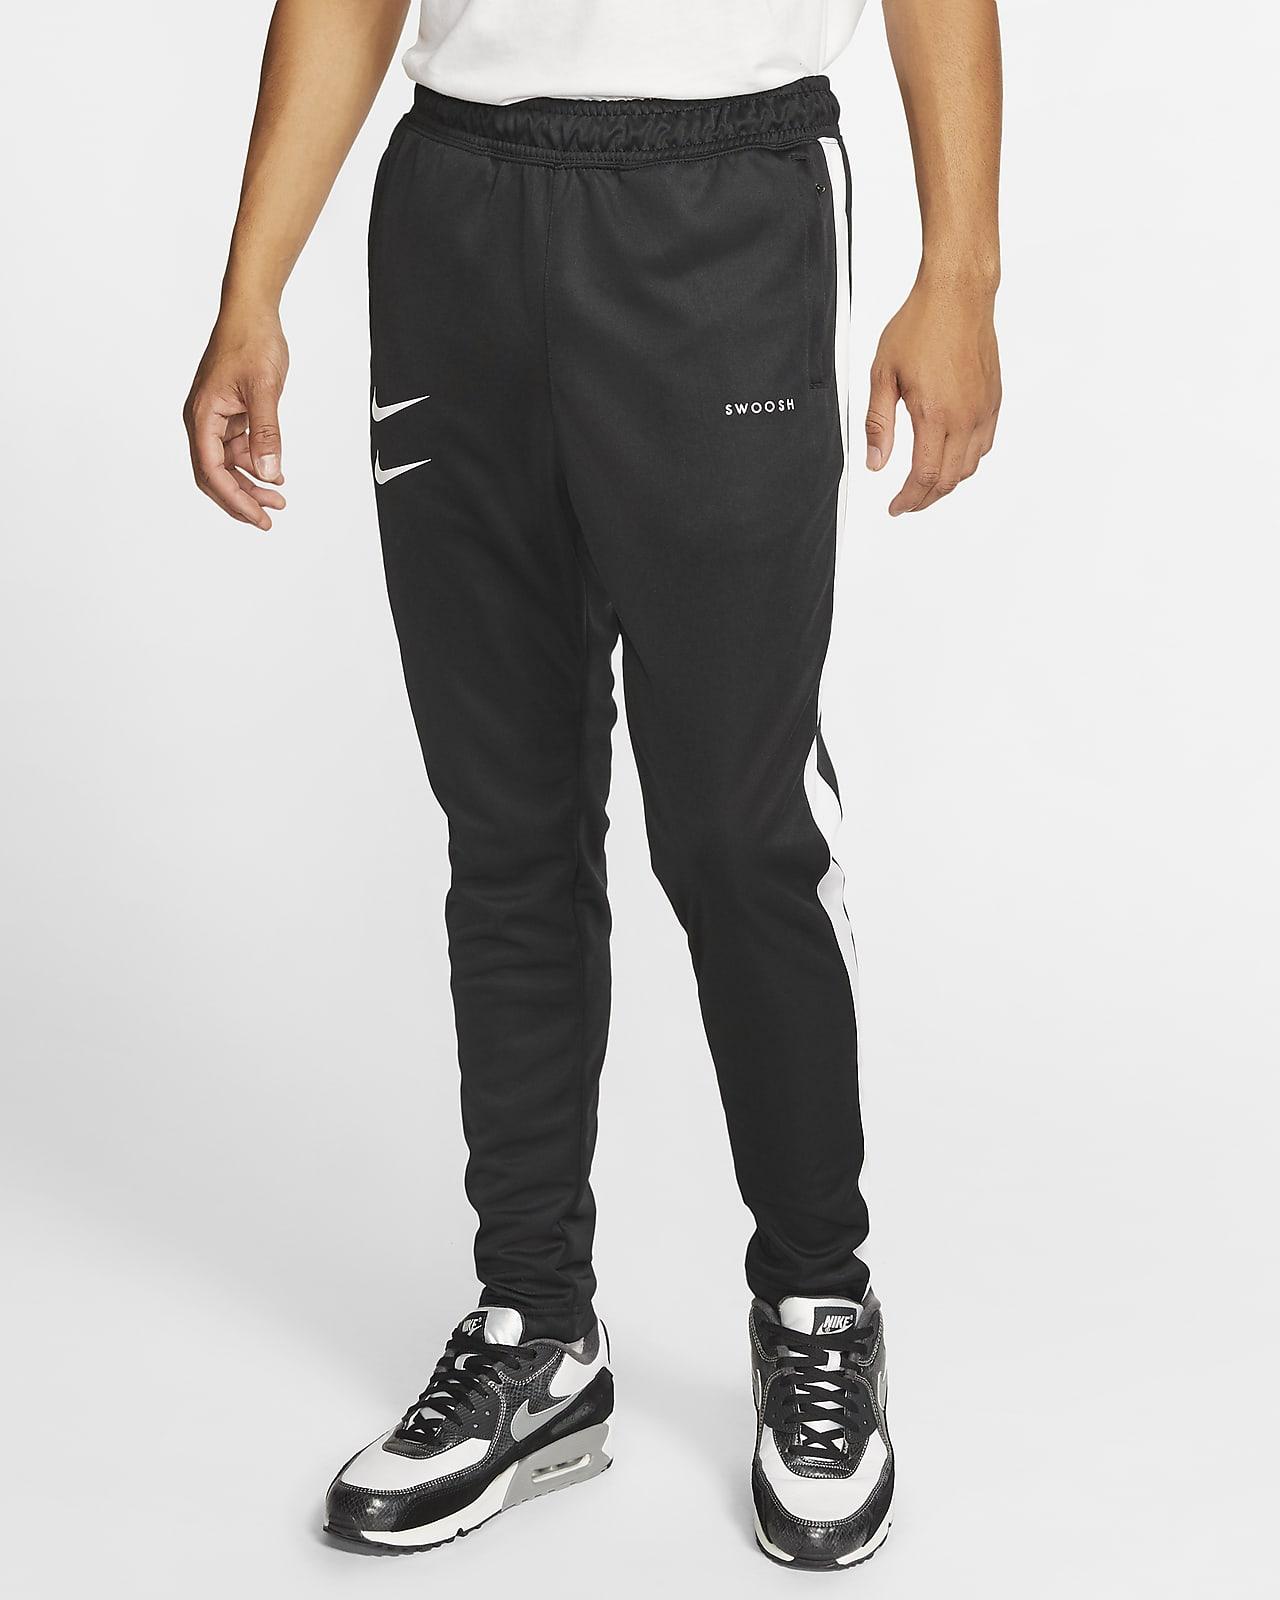 Nike Sportswear Swoosh Herenbroek